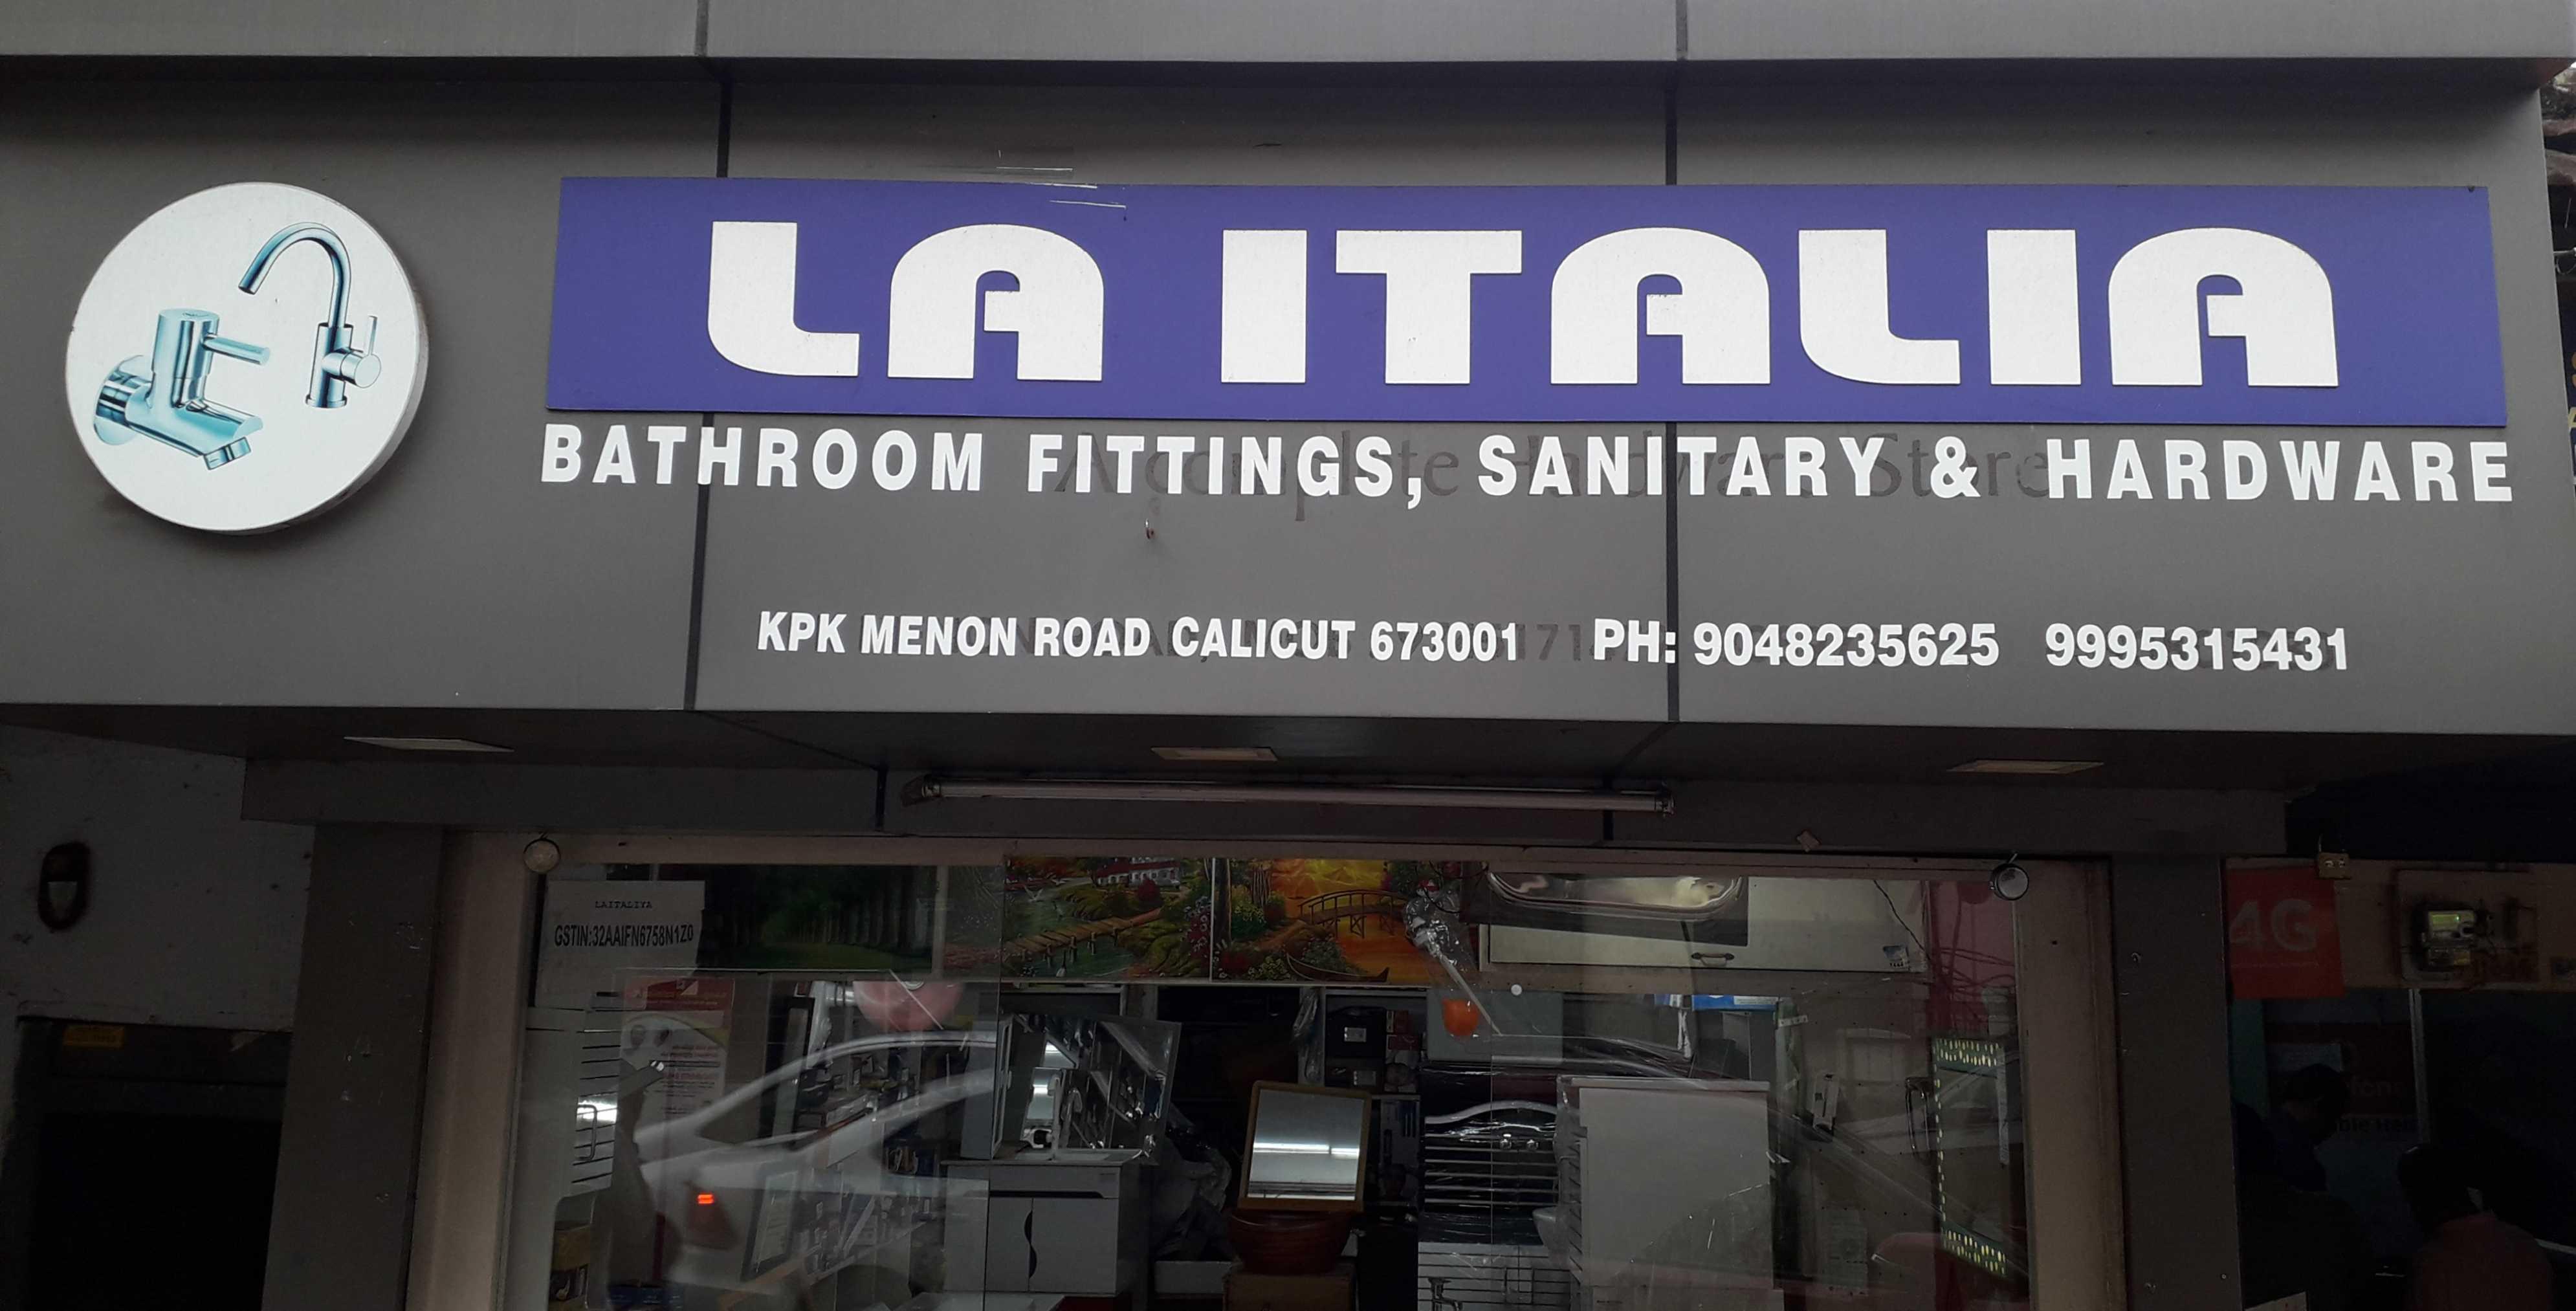 LA ITALIA, SANITARY SHOP,  service in Kozhikode Town, Kozhikode